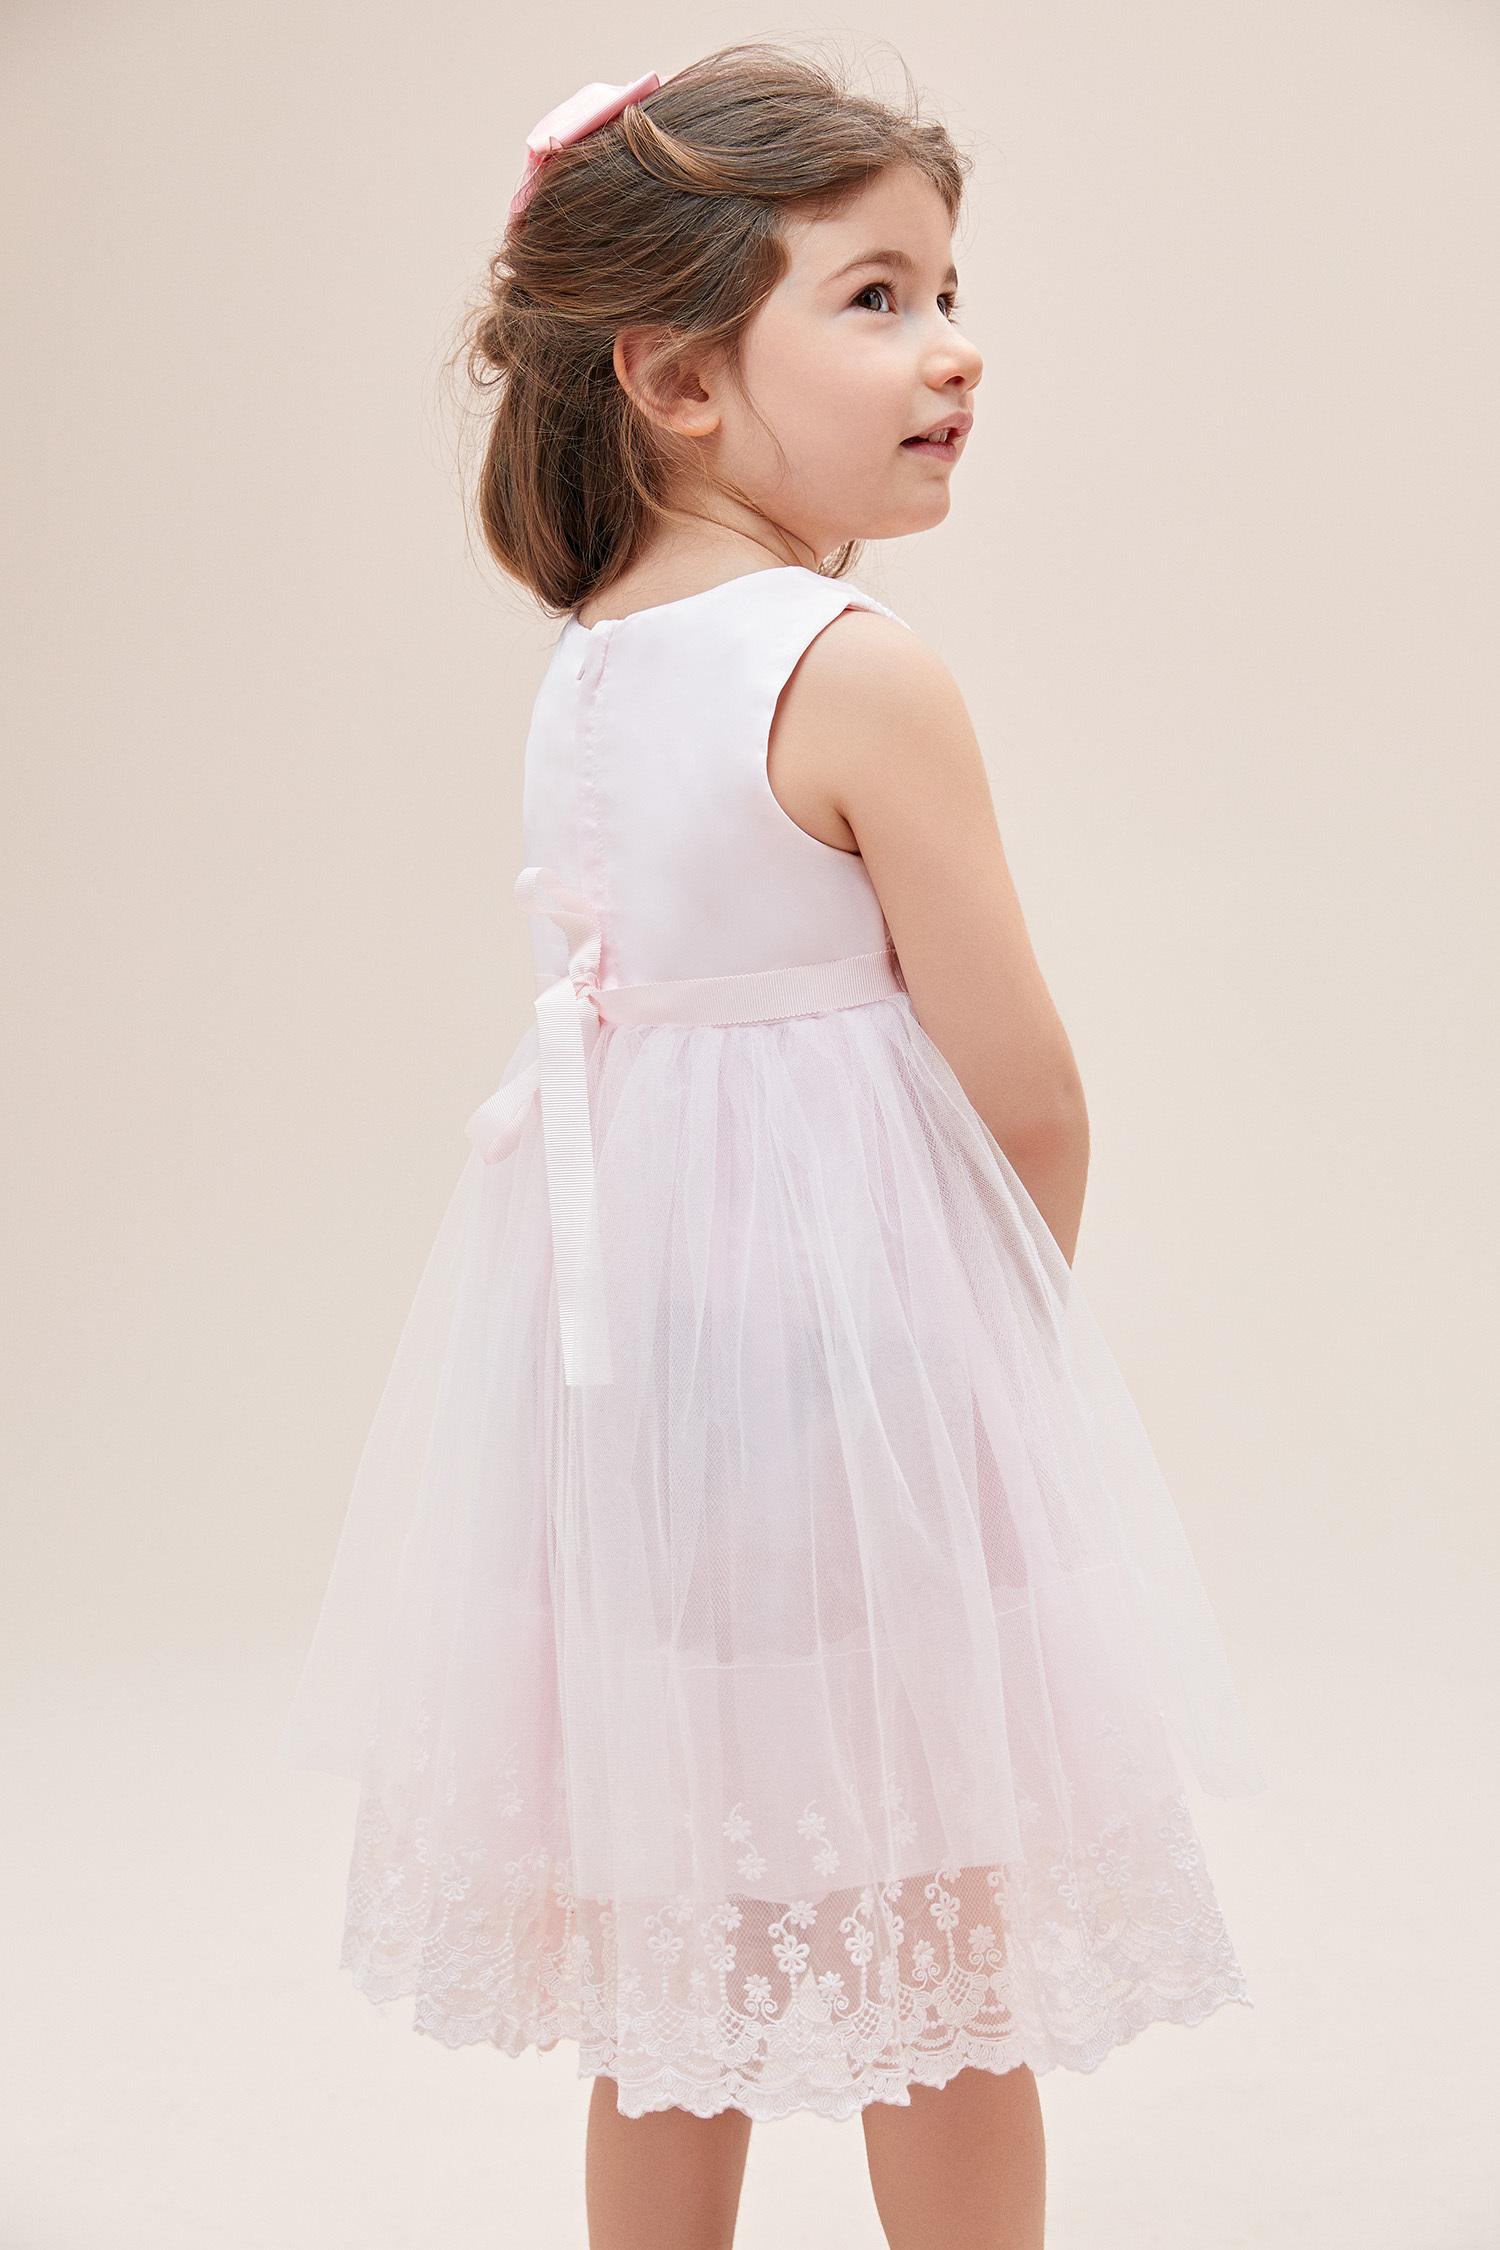 Pembe Askılı Tül Etekli Çocuk Elbisesi - Thumbnail